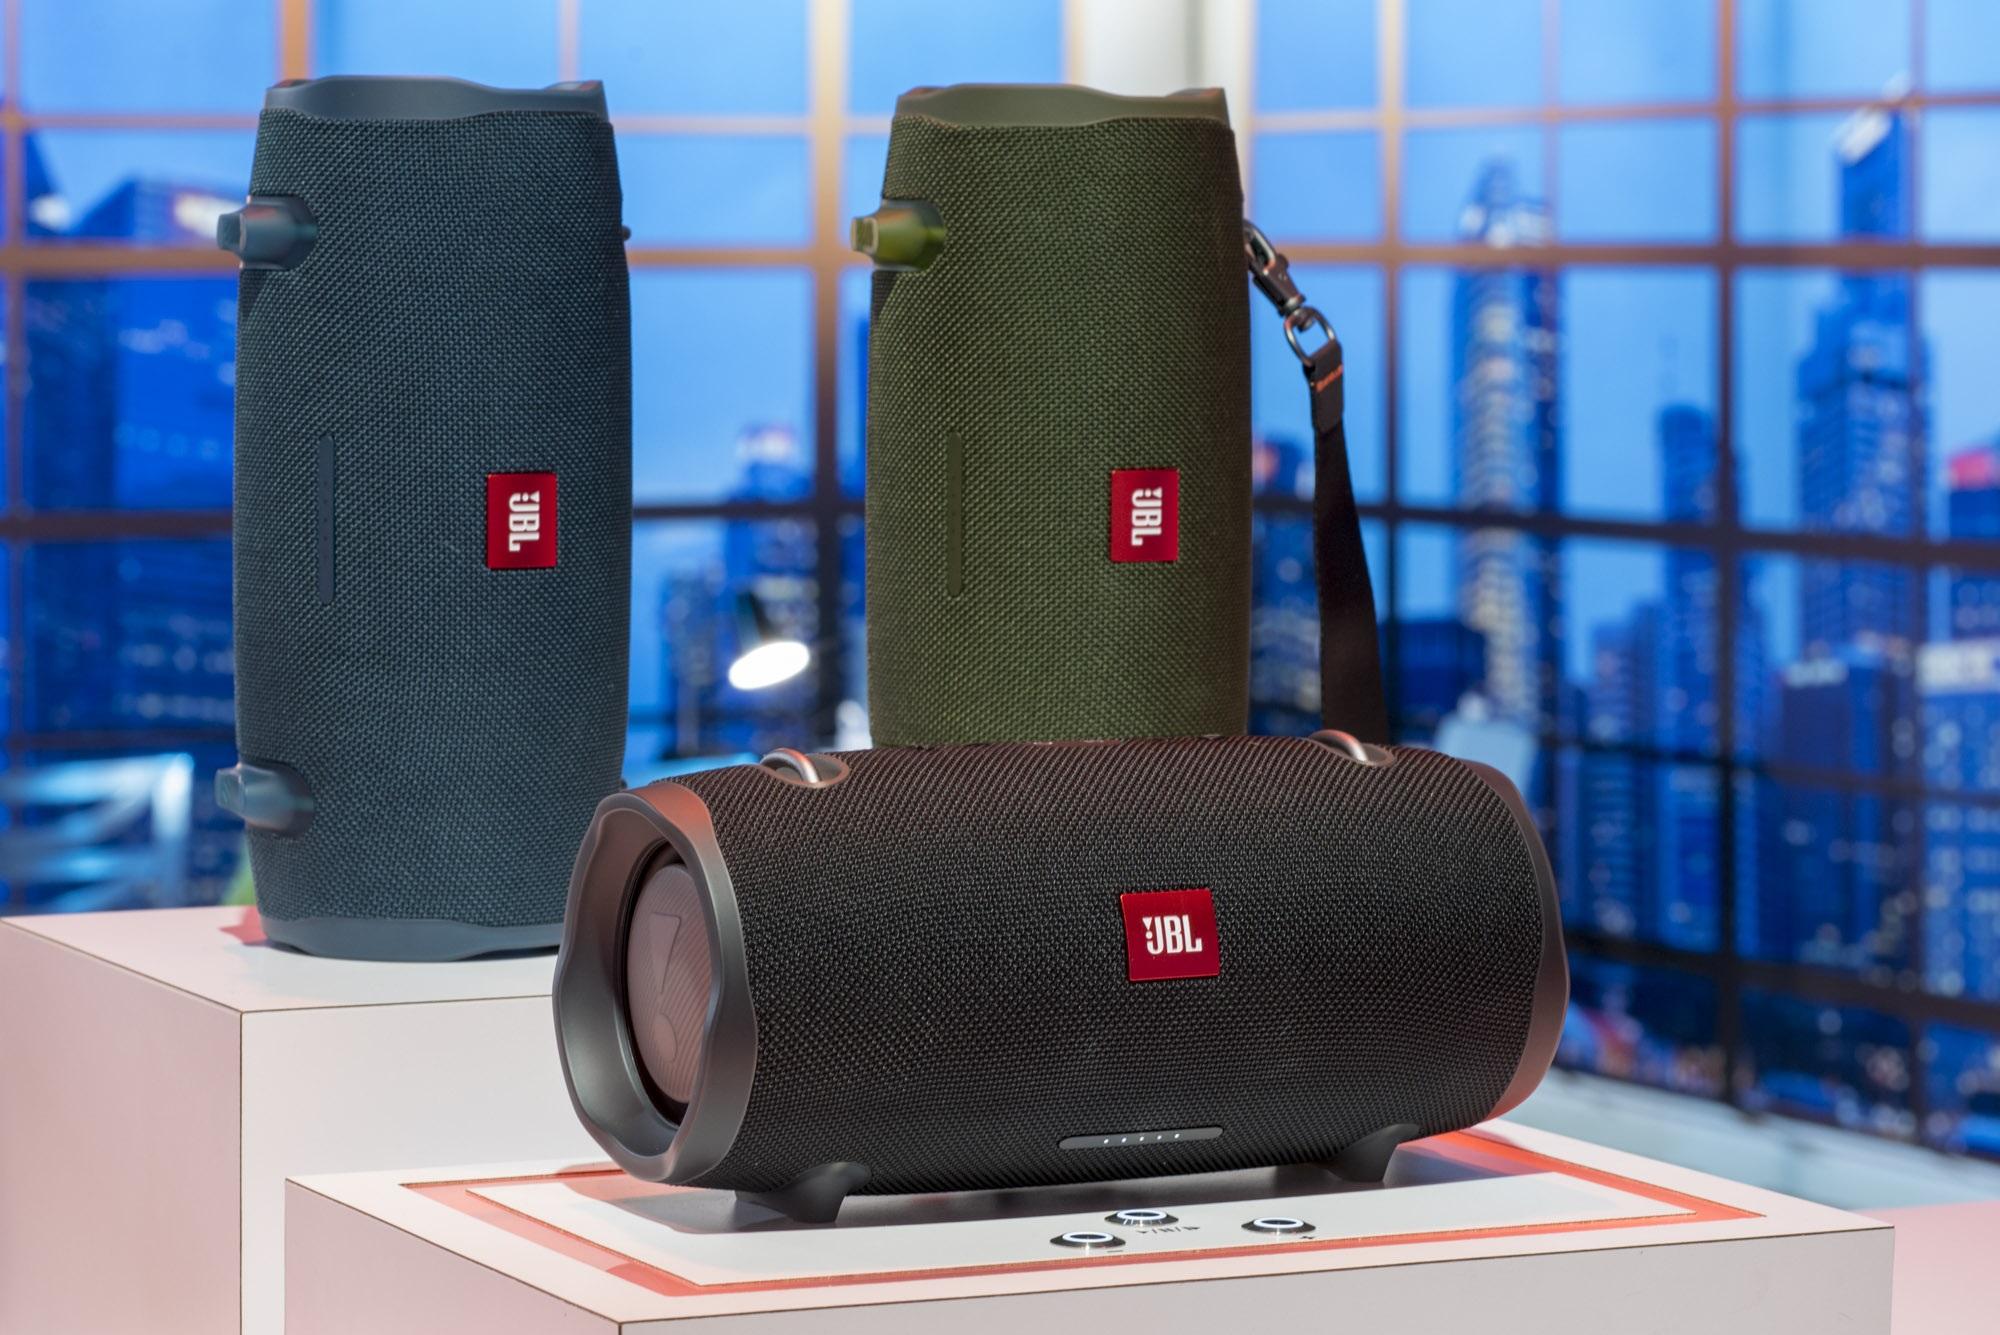 jbl releases google assistant enabled headphones and upgraded speakers the verge. Black Bedroom Furniture Sets. Home Design Ideas